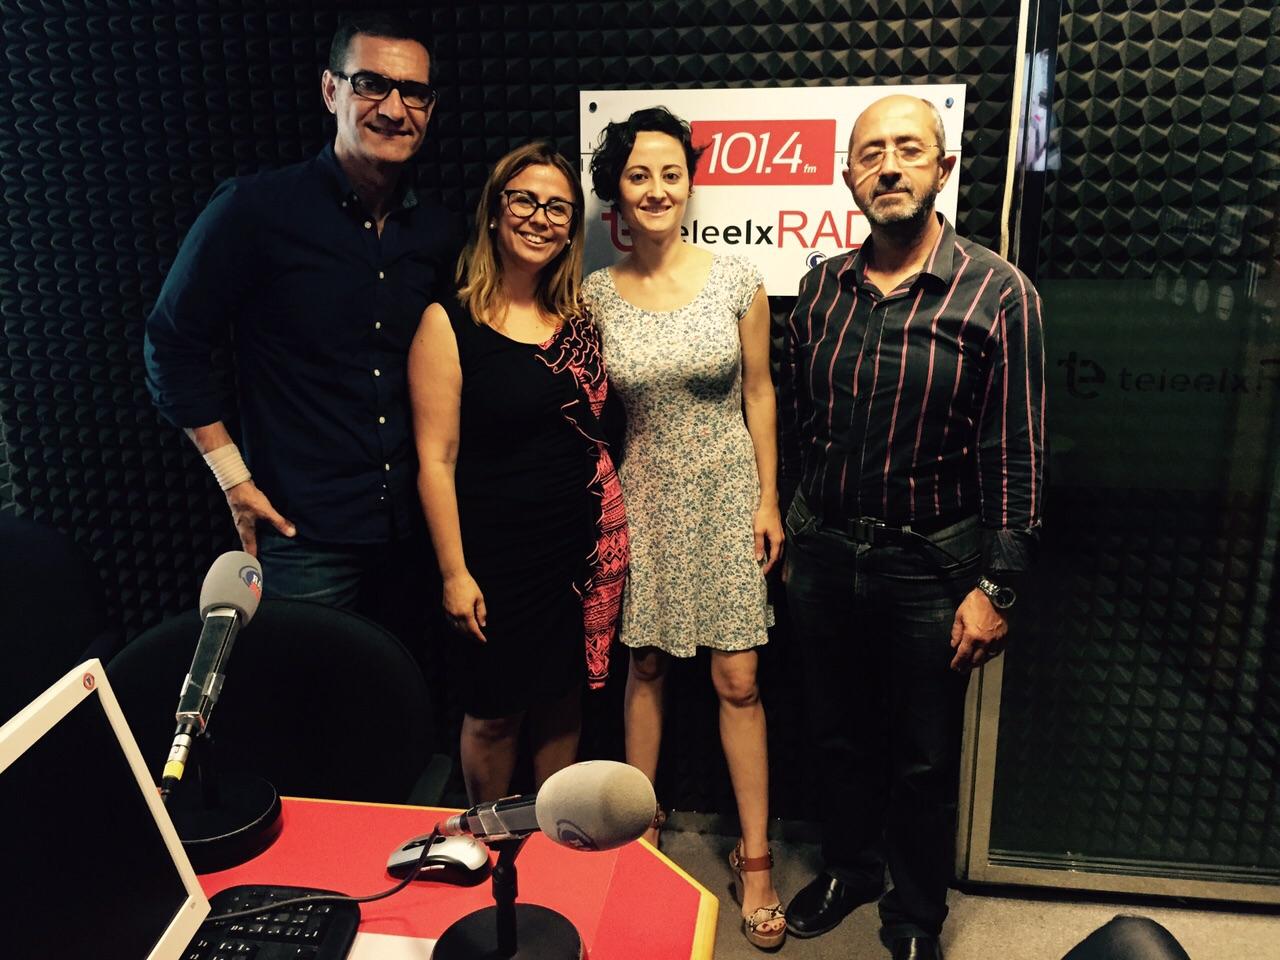 Entrevista de Radio a la abogada Esther Barbudo Vázquez integrante de ILLICE LEX.